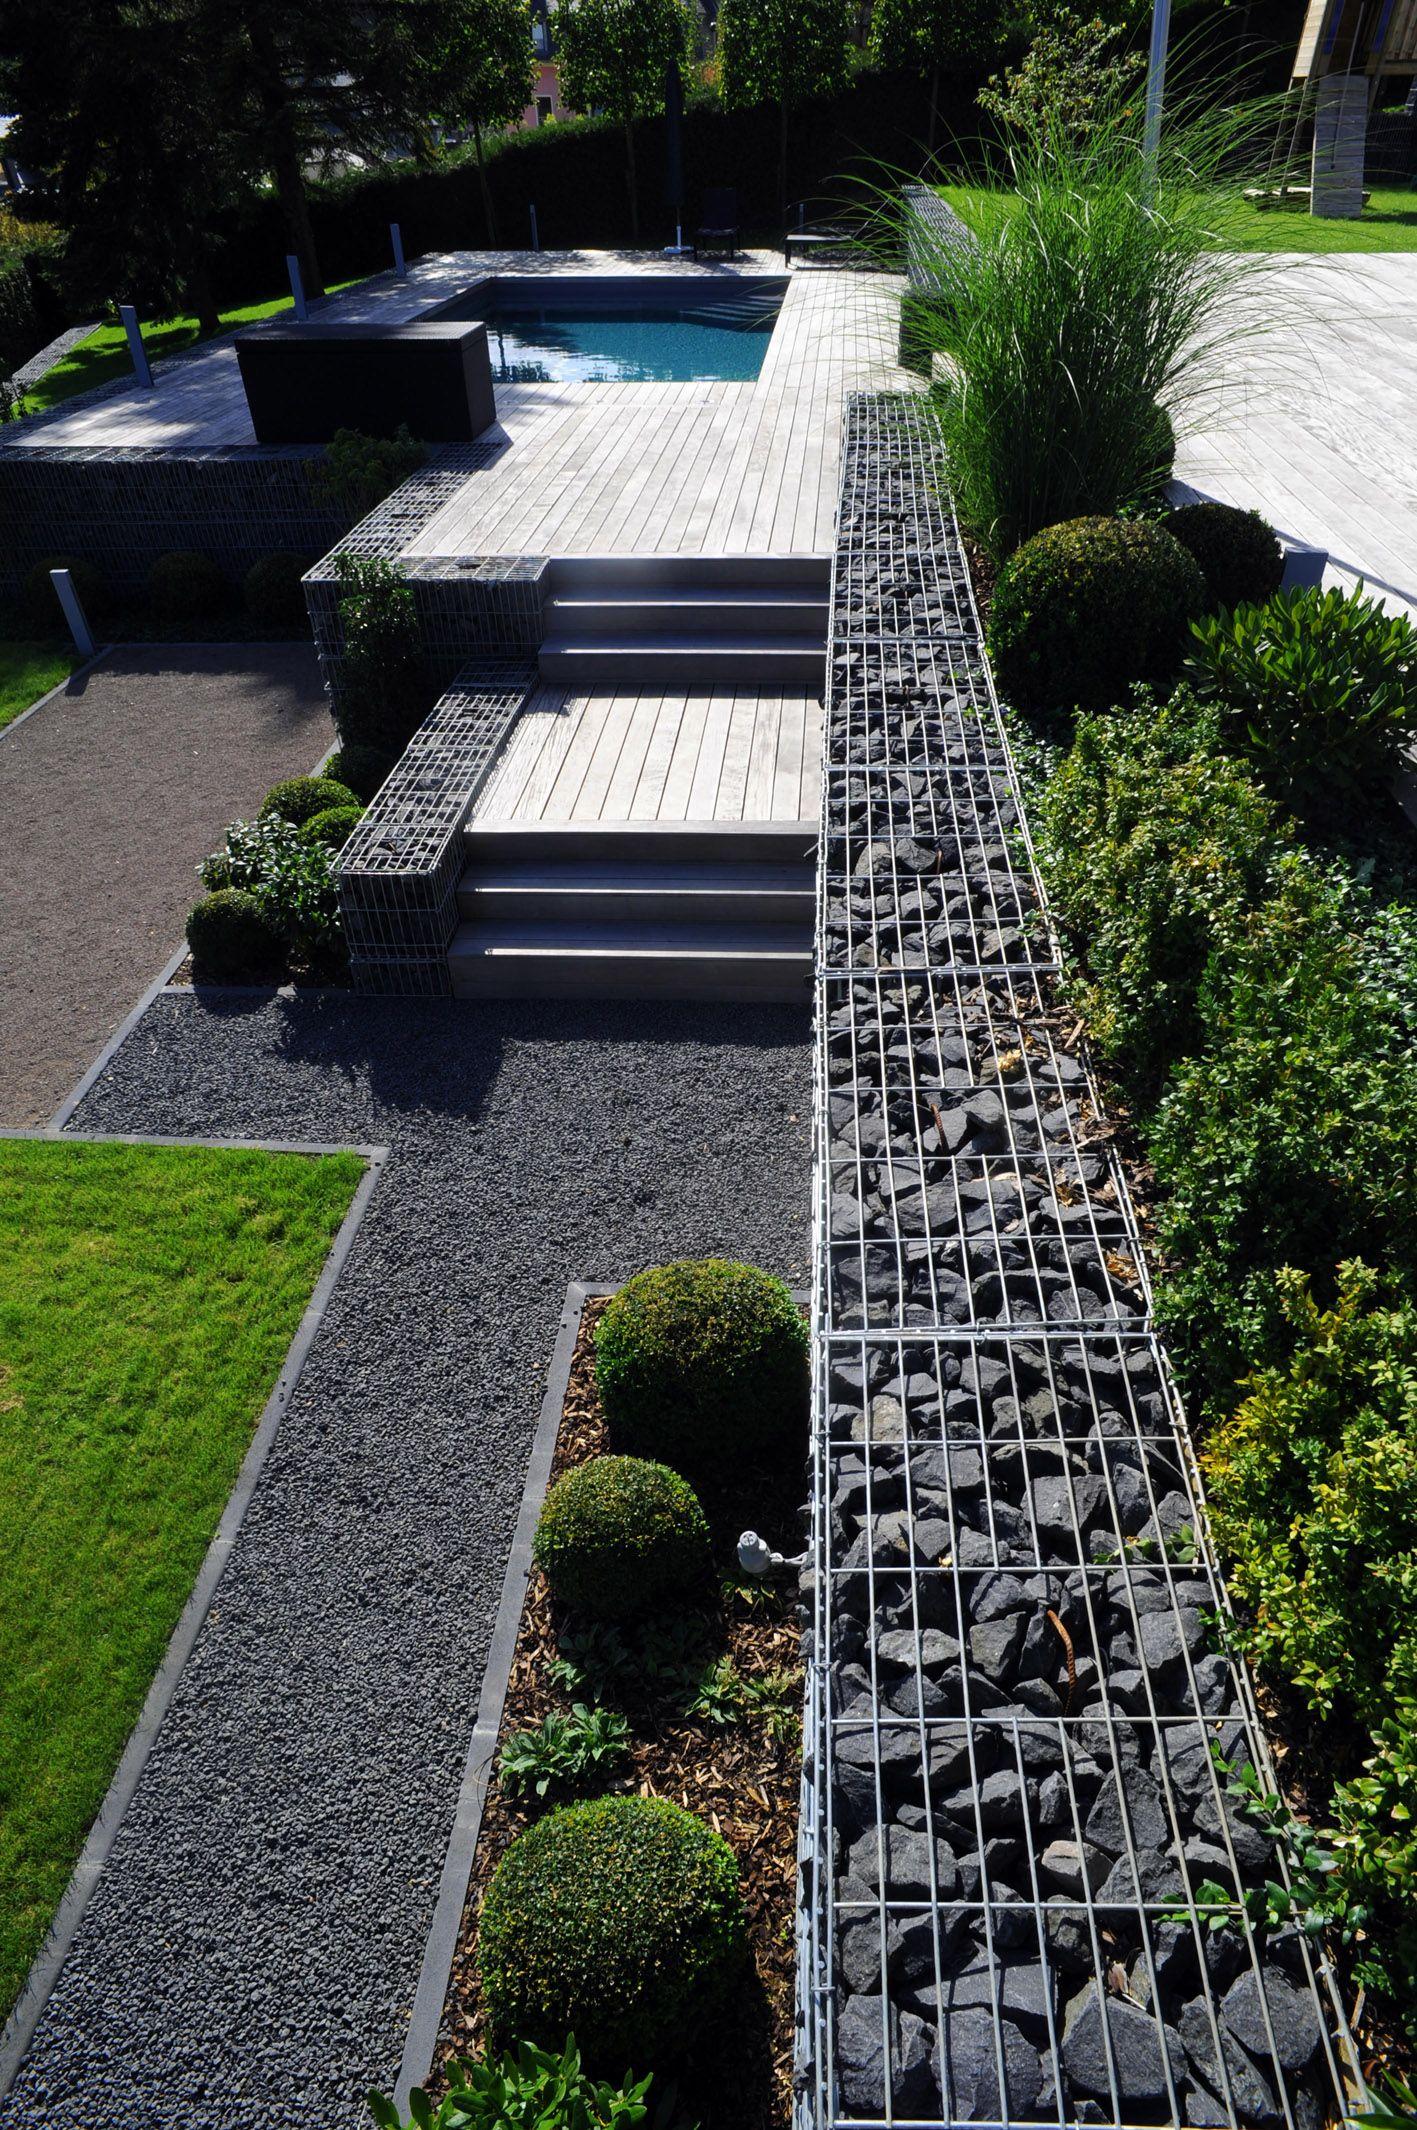 Terrassa - Jardí Decorada Amb Gabions De Pedres | Jardins ... intérieur Gabion Deco Jardin